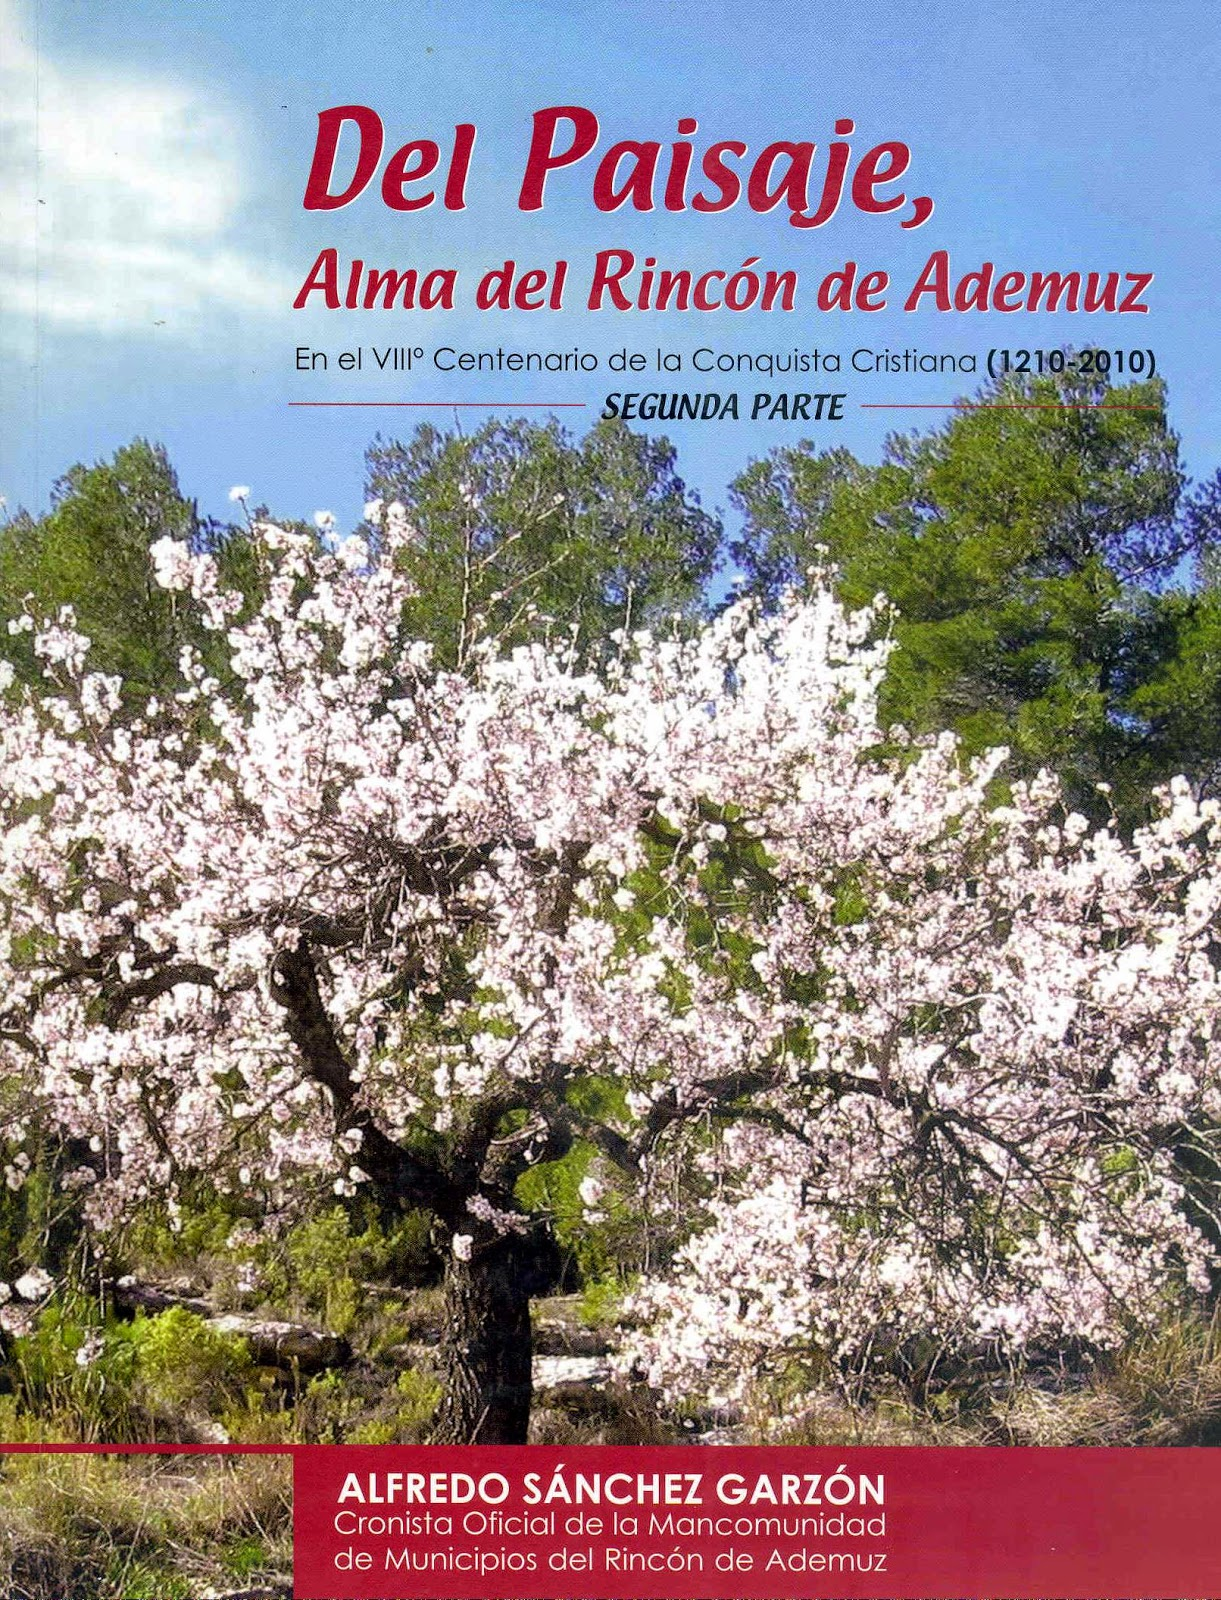 paisaje-rincon-ademuz-alfredo-sanchez-garzon-2008